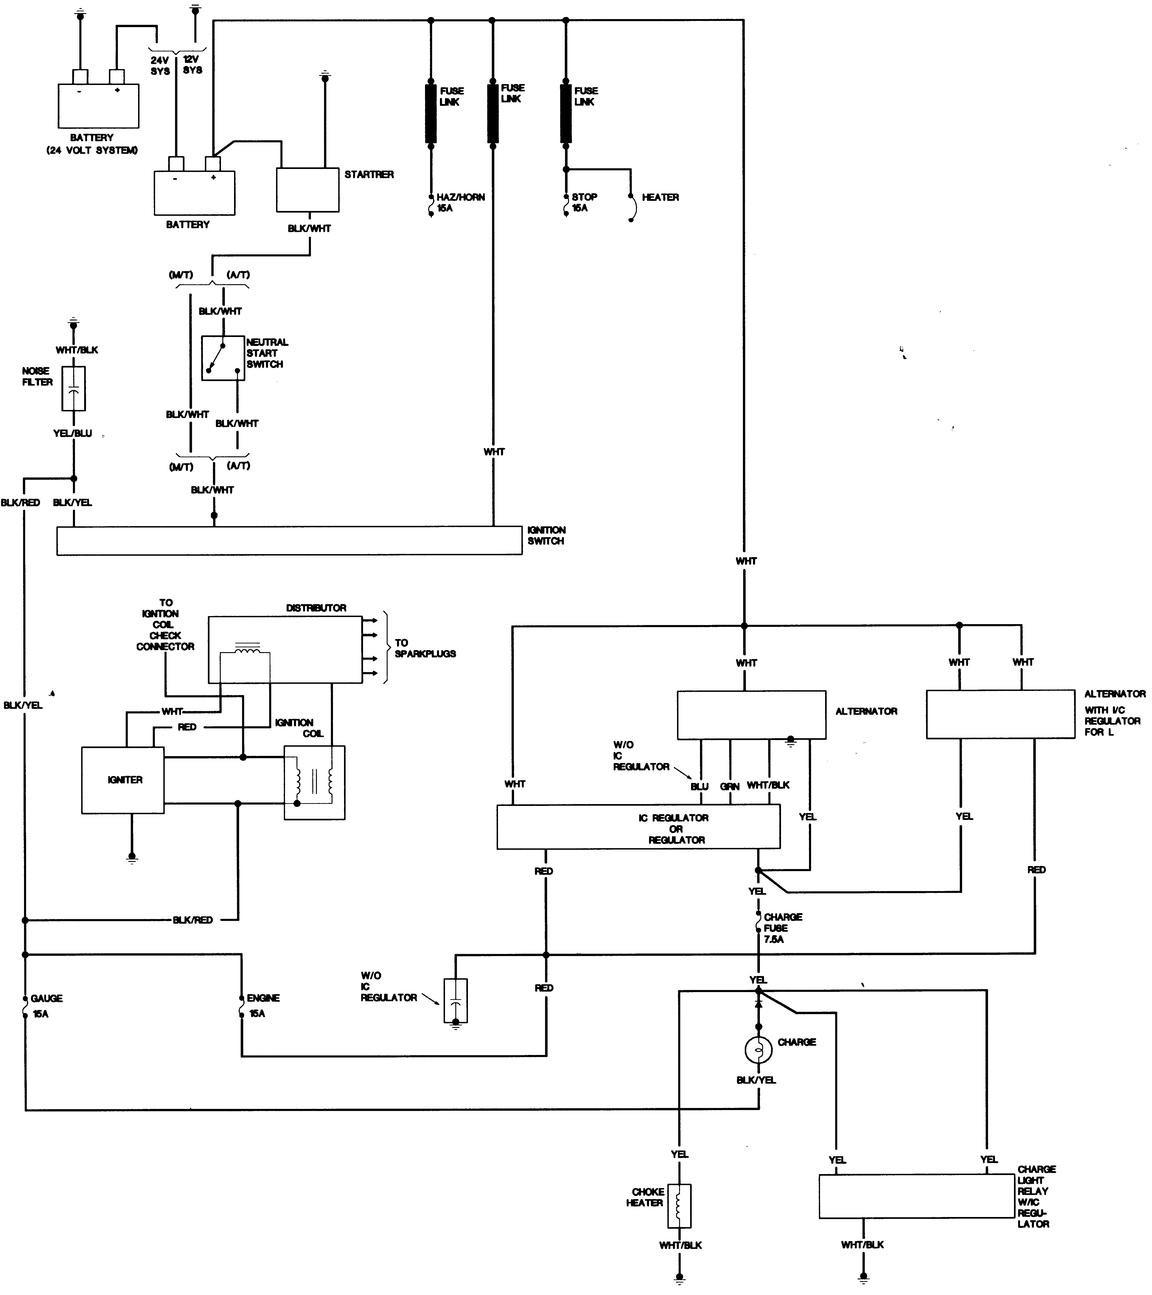 4 Wire Alternator Wiring Diagram Ford Inside Voltage Regulator With 24V